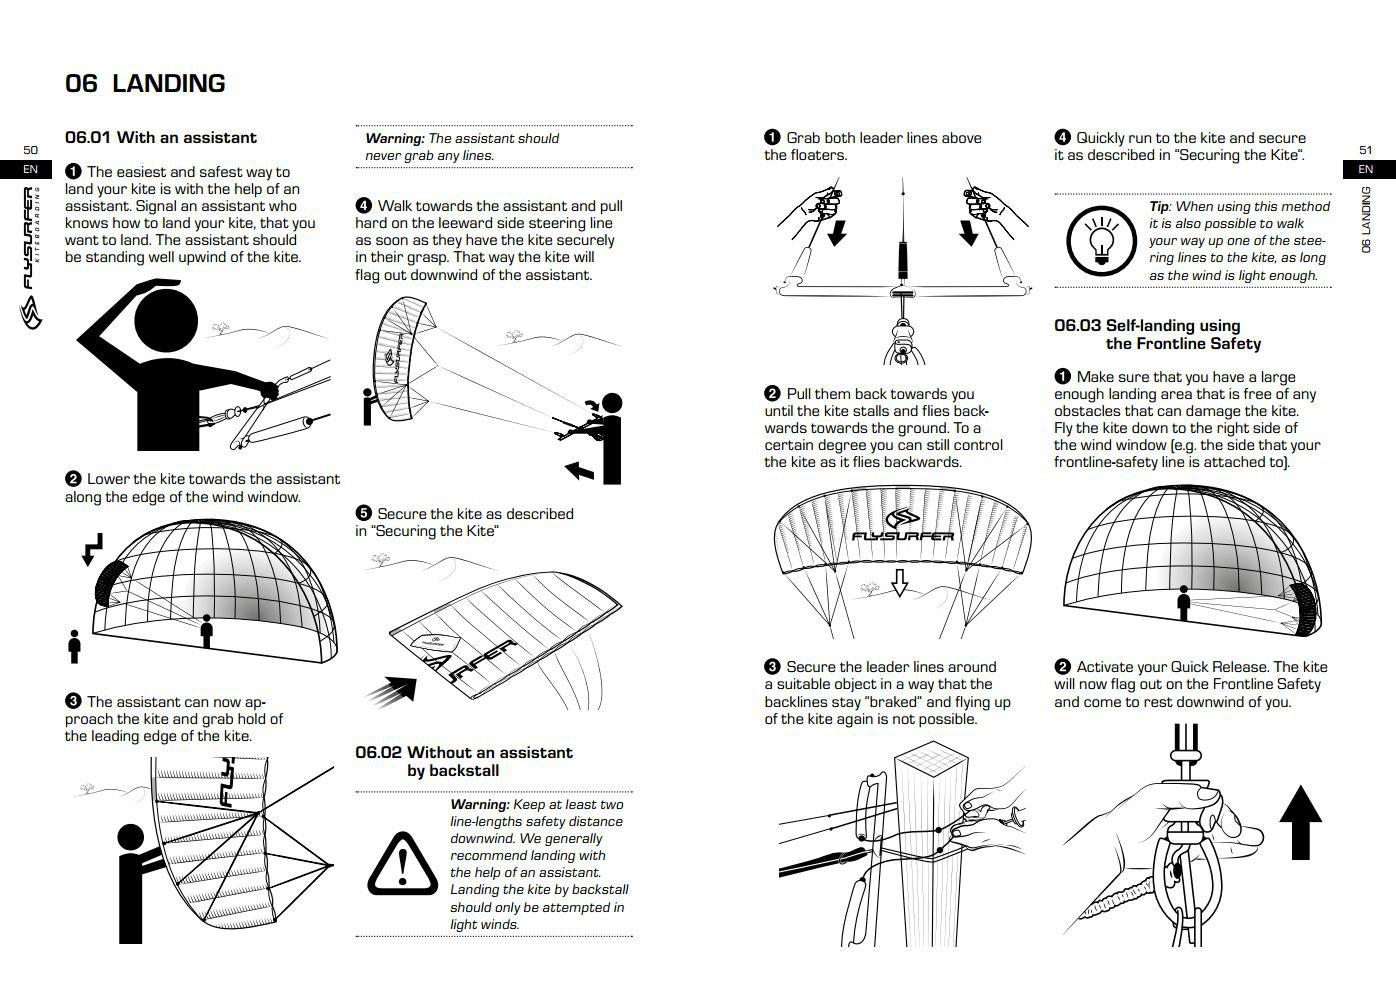 Manuale kitesurf | Manuale kite imparare il kitesurf